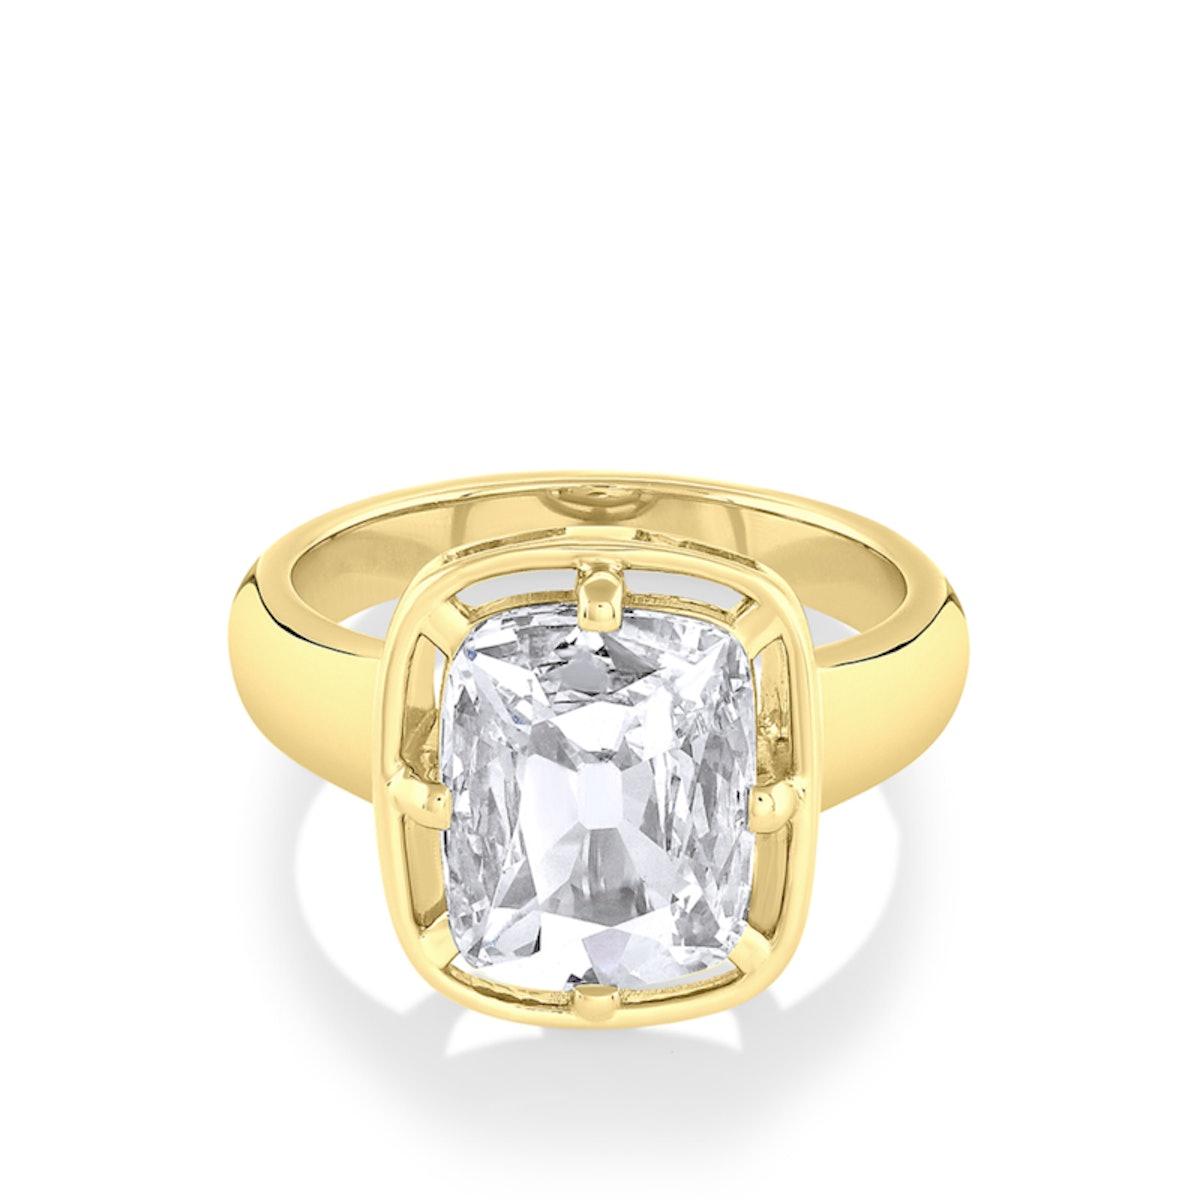 3.01ct Cushion Diamond Georgia Engagement Ring from Marrow Fine.